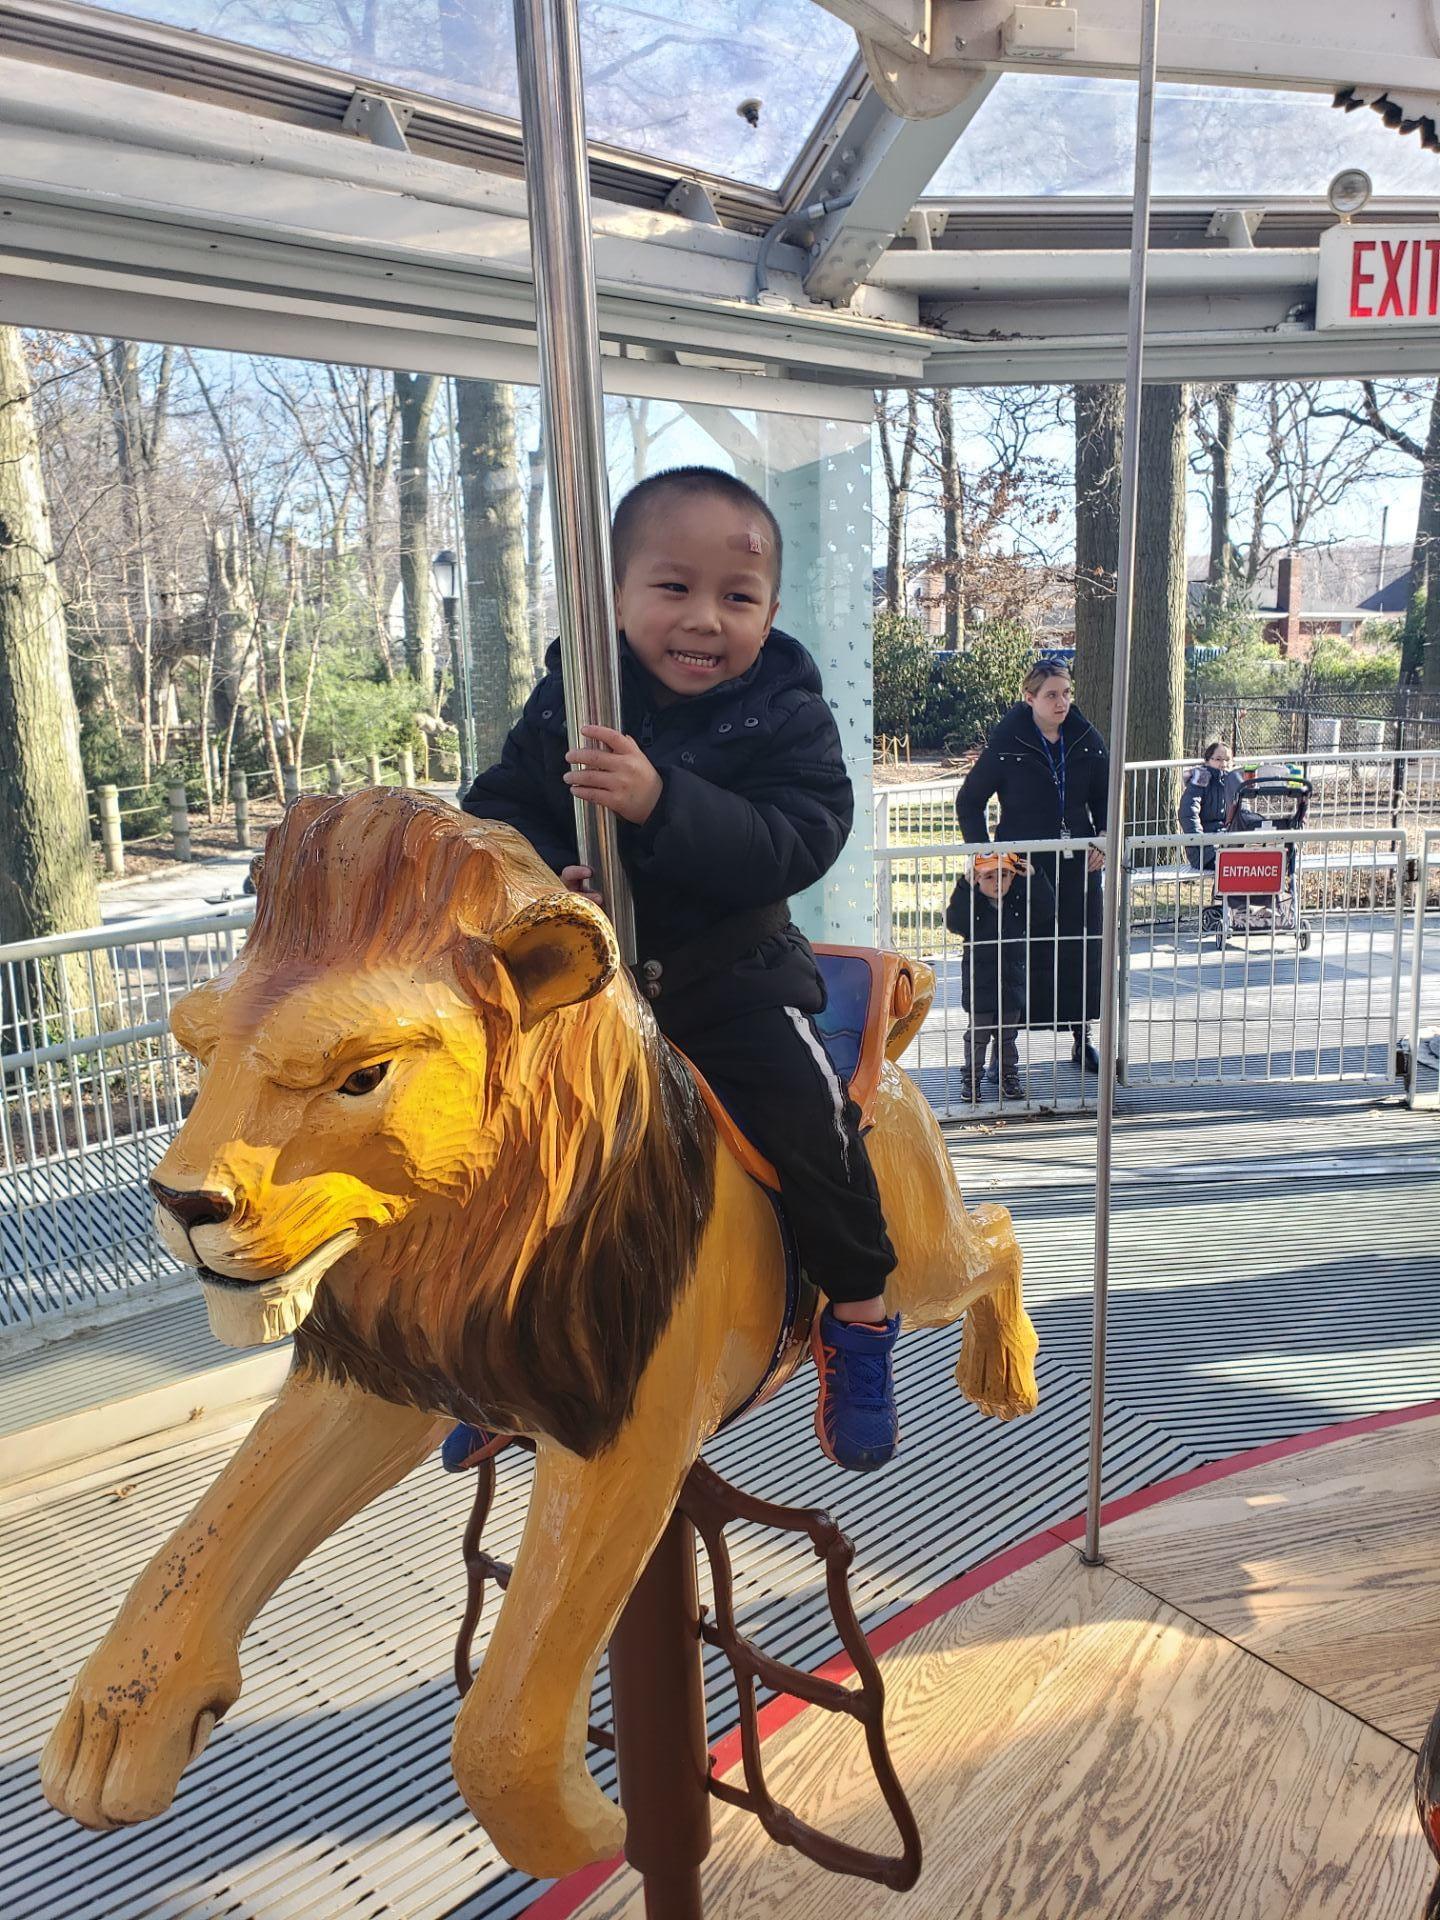 child on carousel